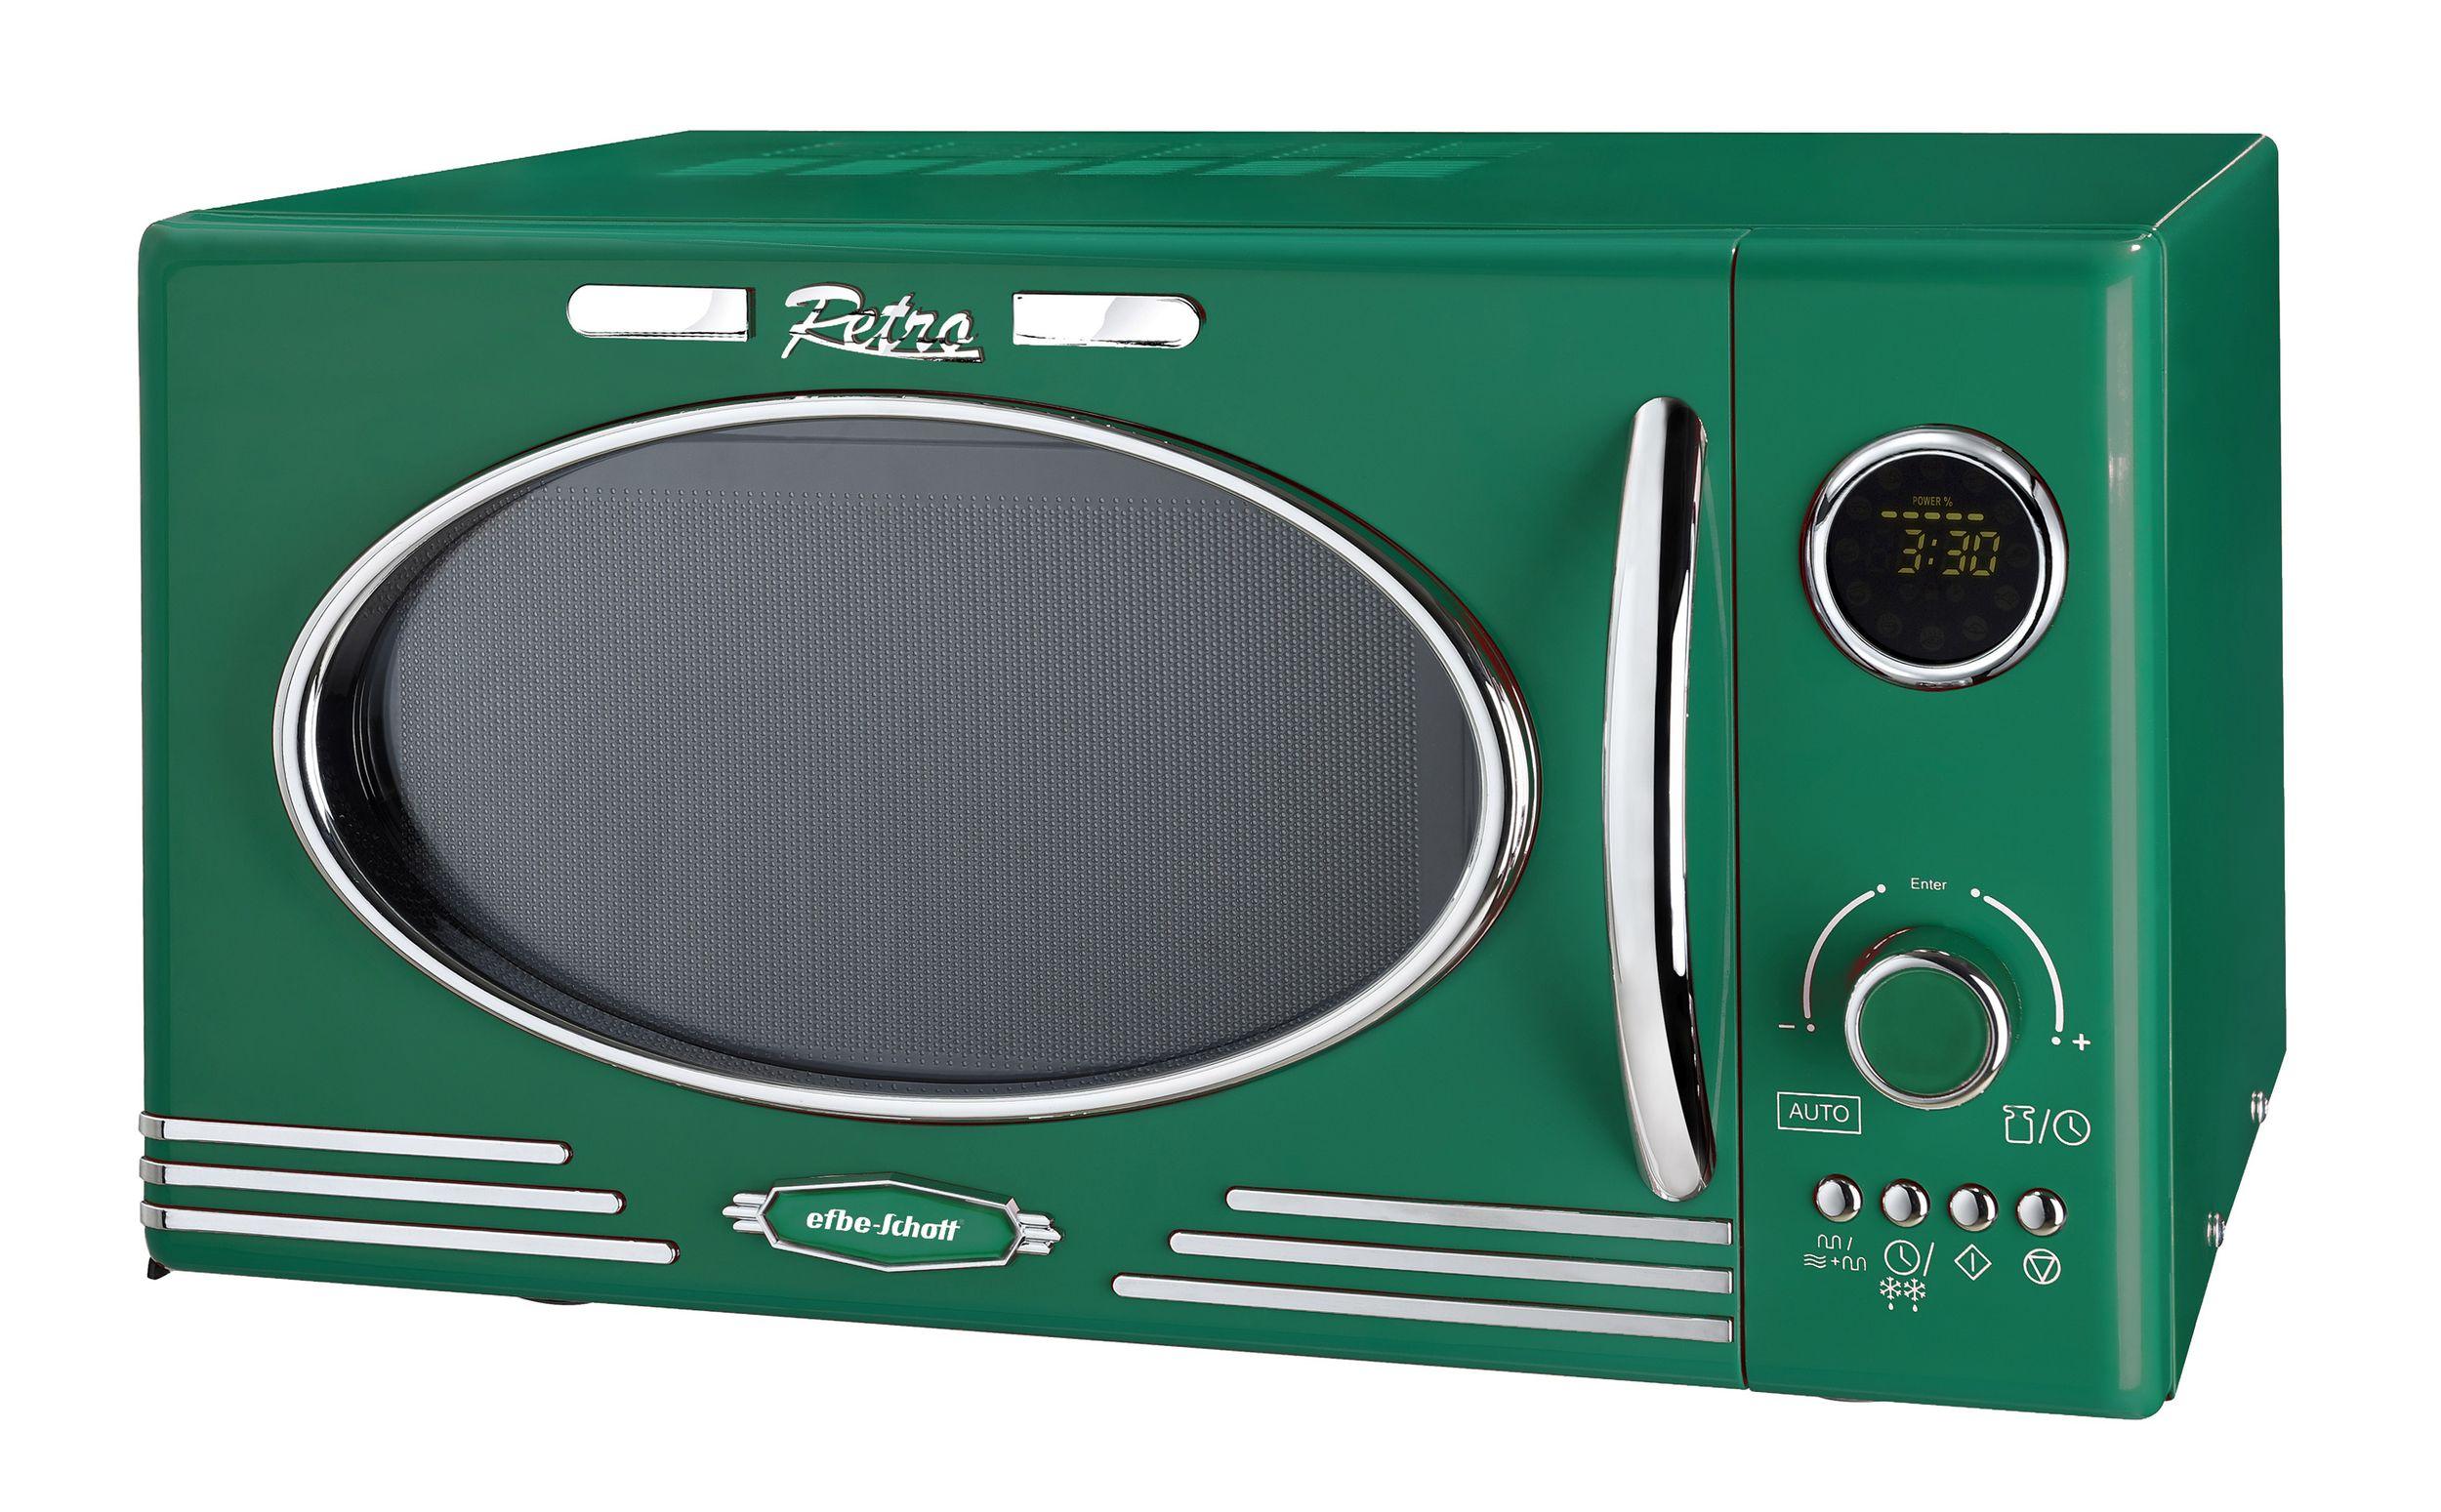 Retro Mikrowelle 1000Watt Grill 25 Liter dunkelgrün Vintage(Karton beschädigt)*63674